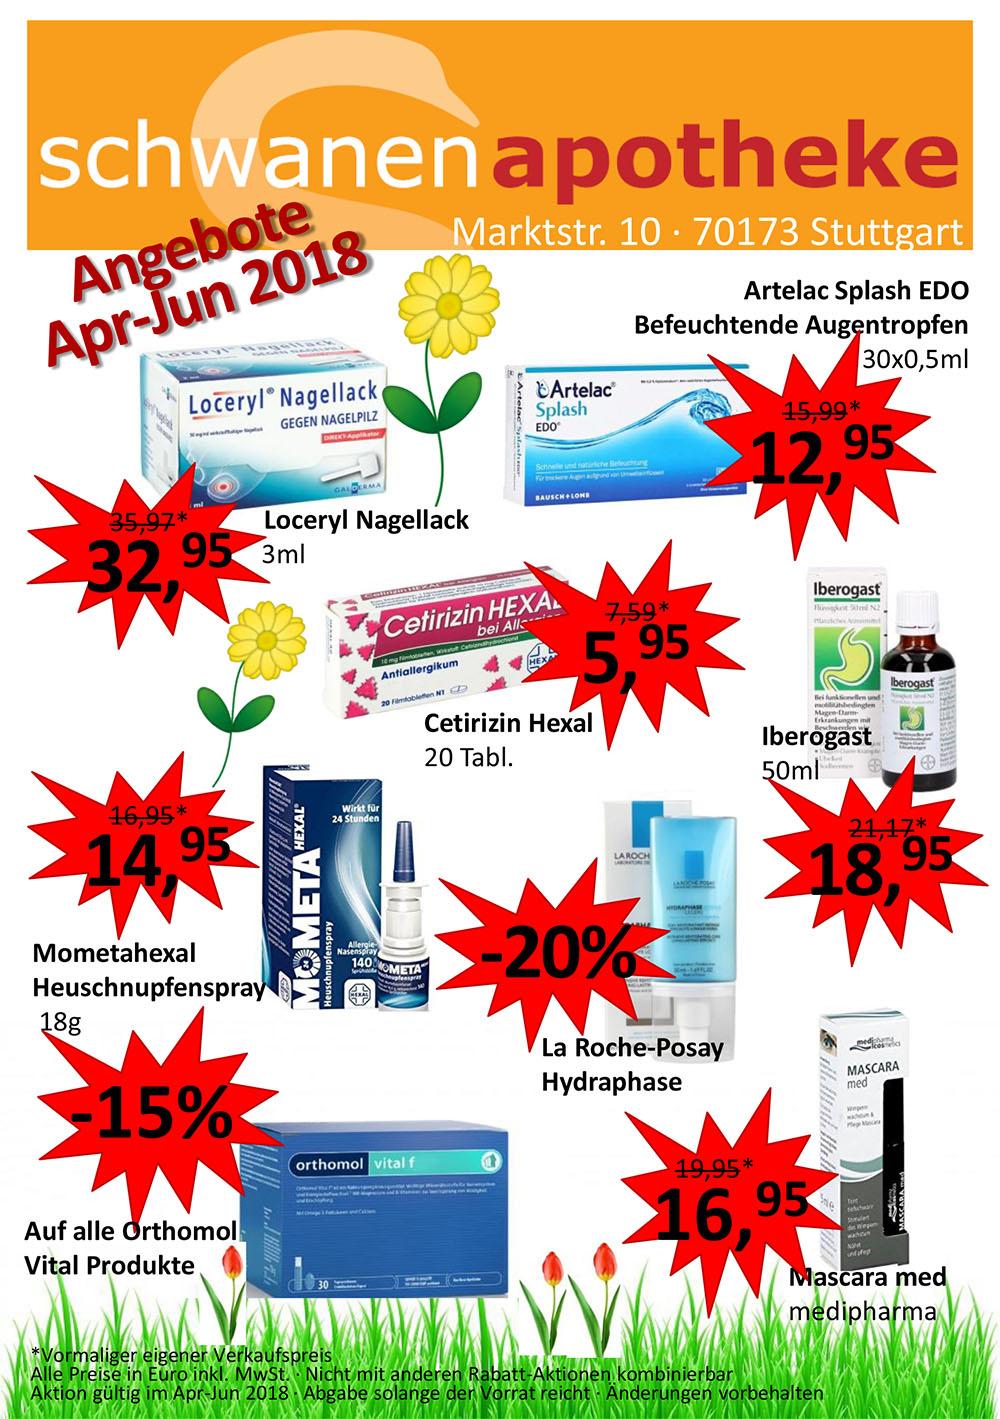 http://www.apotheken.de/fileadmin/clubarea/00000-Angebote/70173_schwanen_angebot_1.jpg